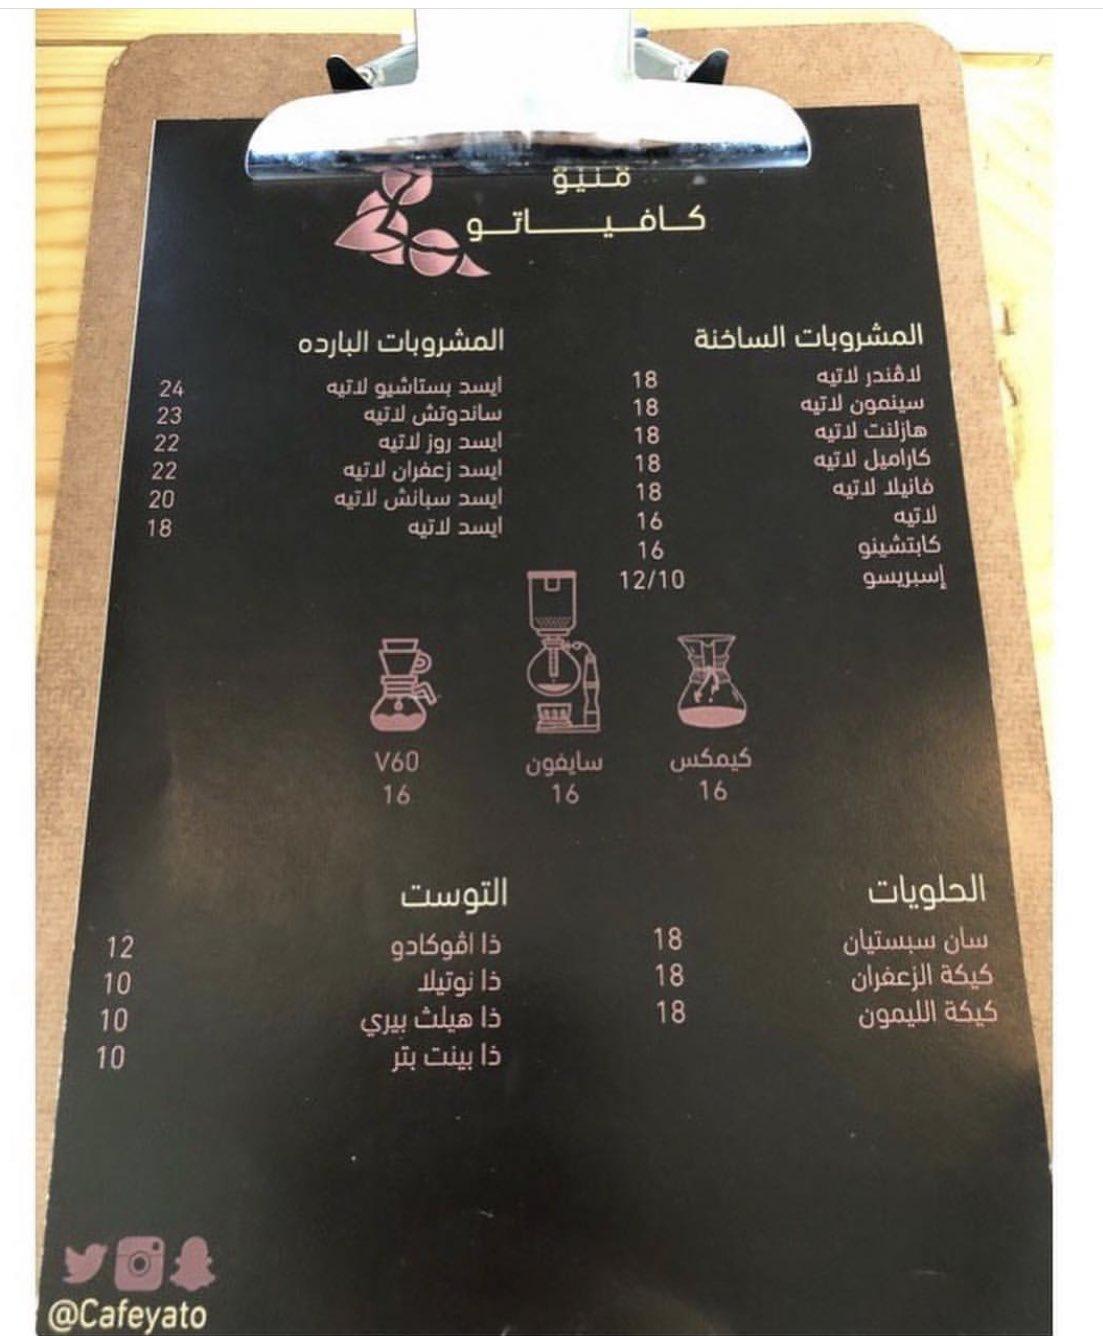 kavito cafe menu